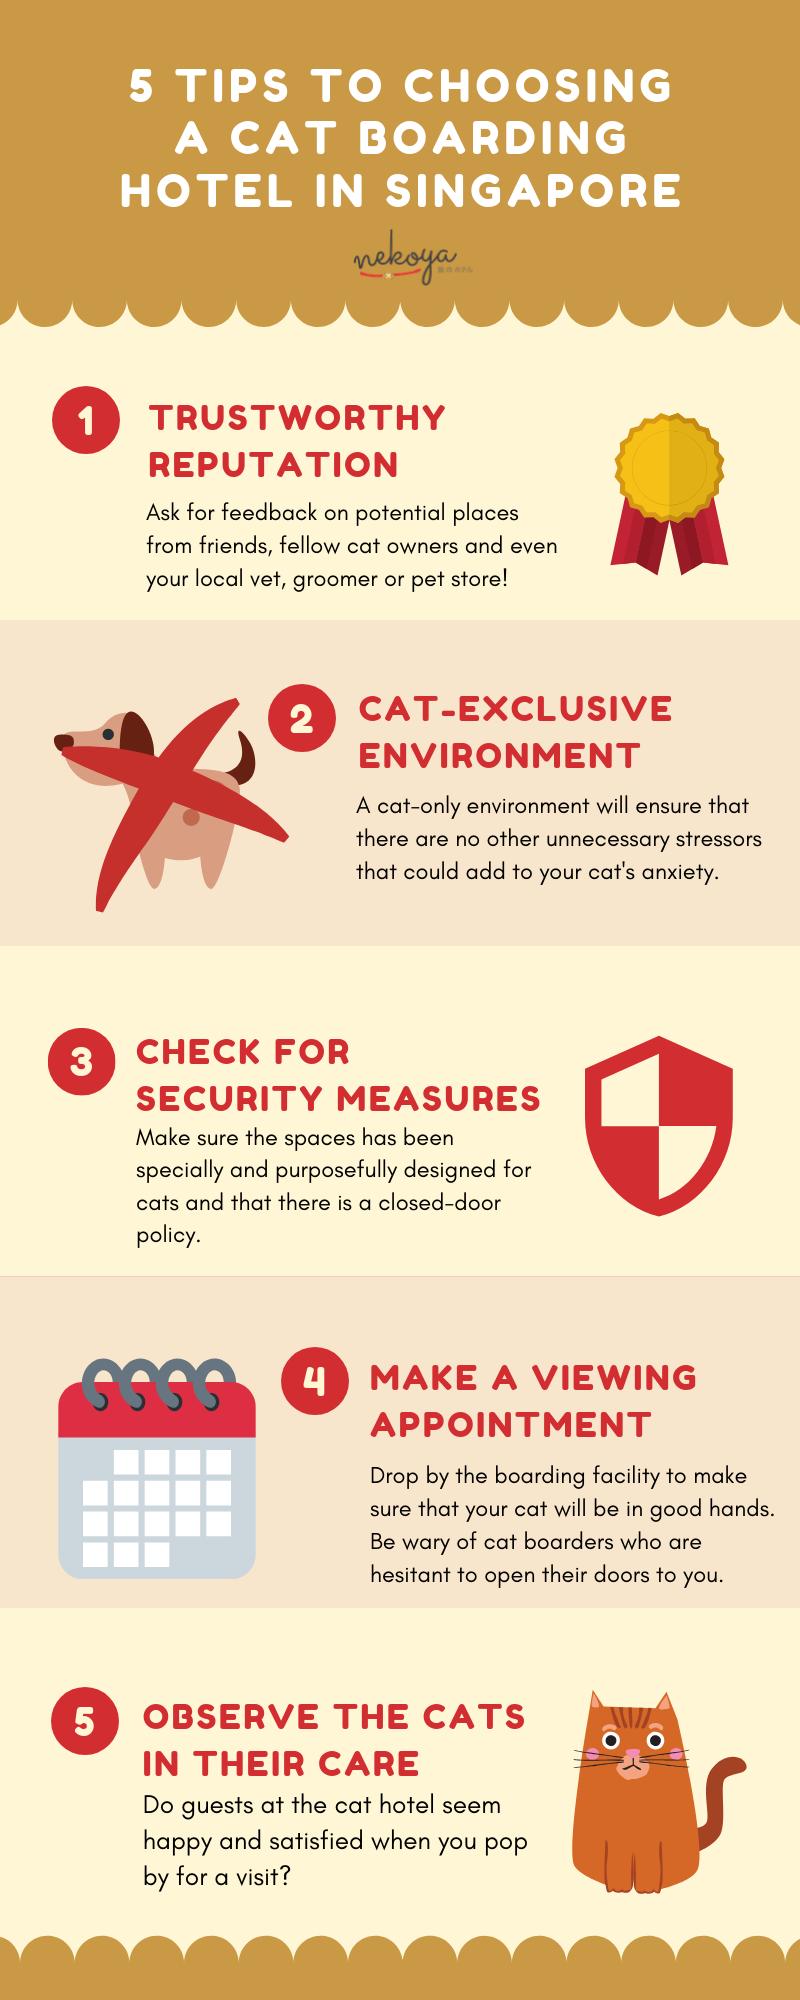 nekoya choosing a cat boarding hotel in singapore infographic